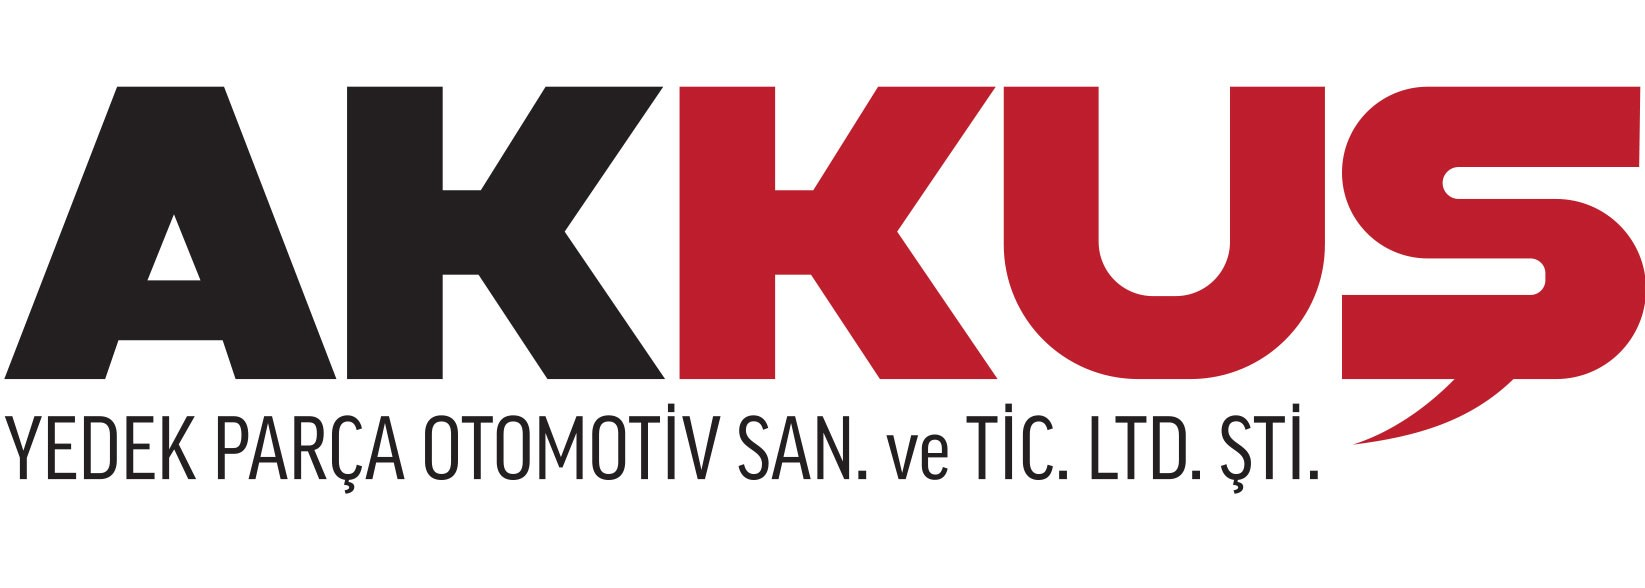 Akkus Yedek Parca Otomotiv Sanayi ve Ticaret Ltd. Sti.